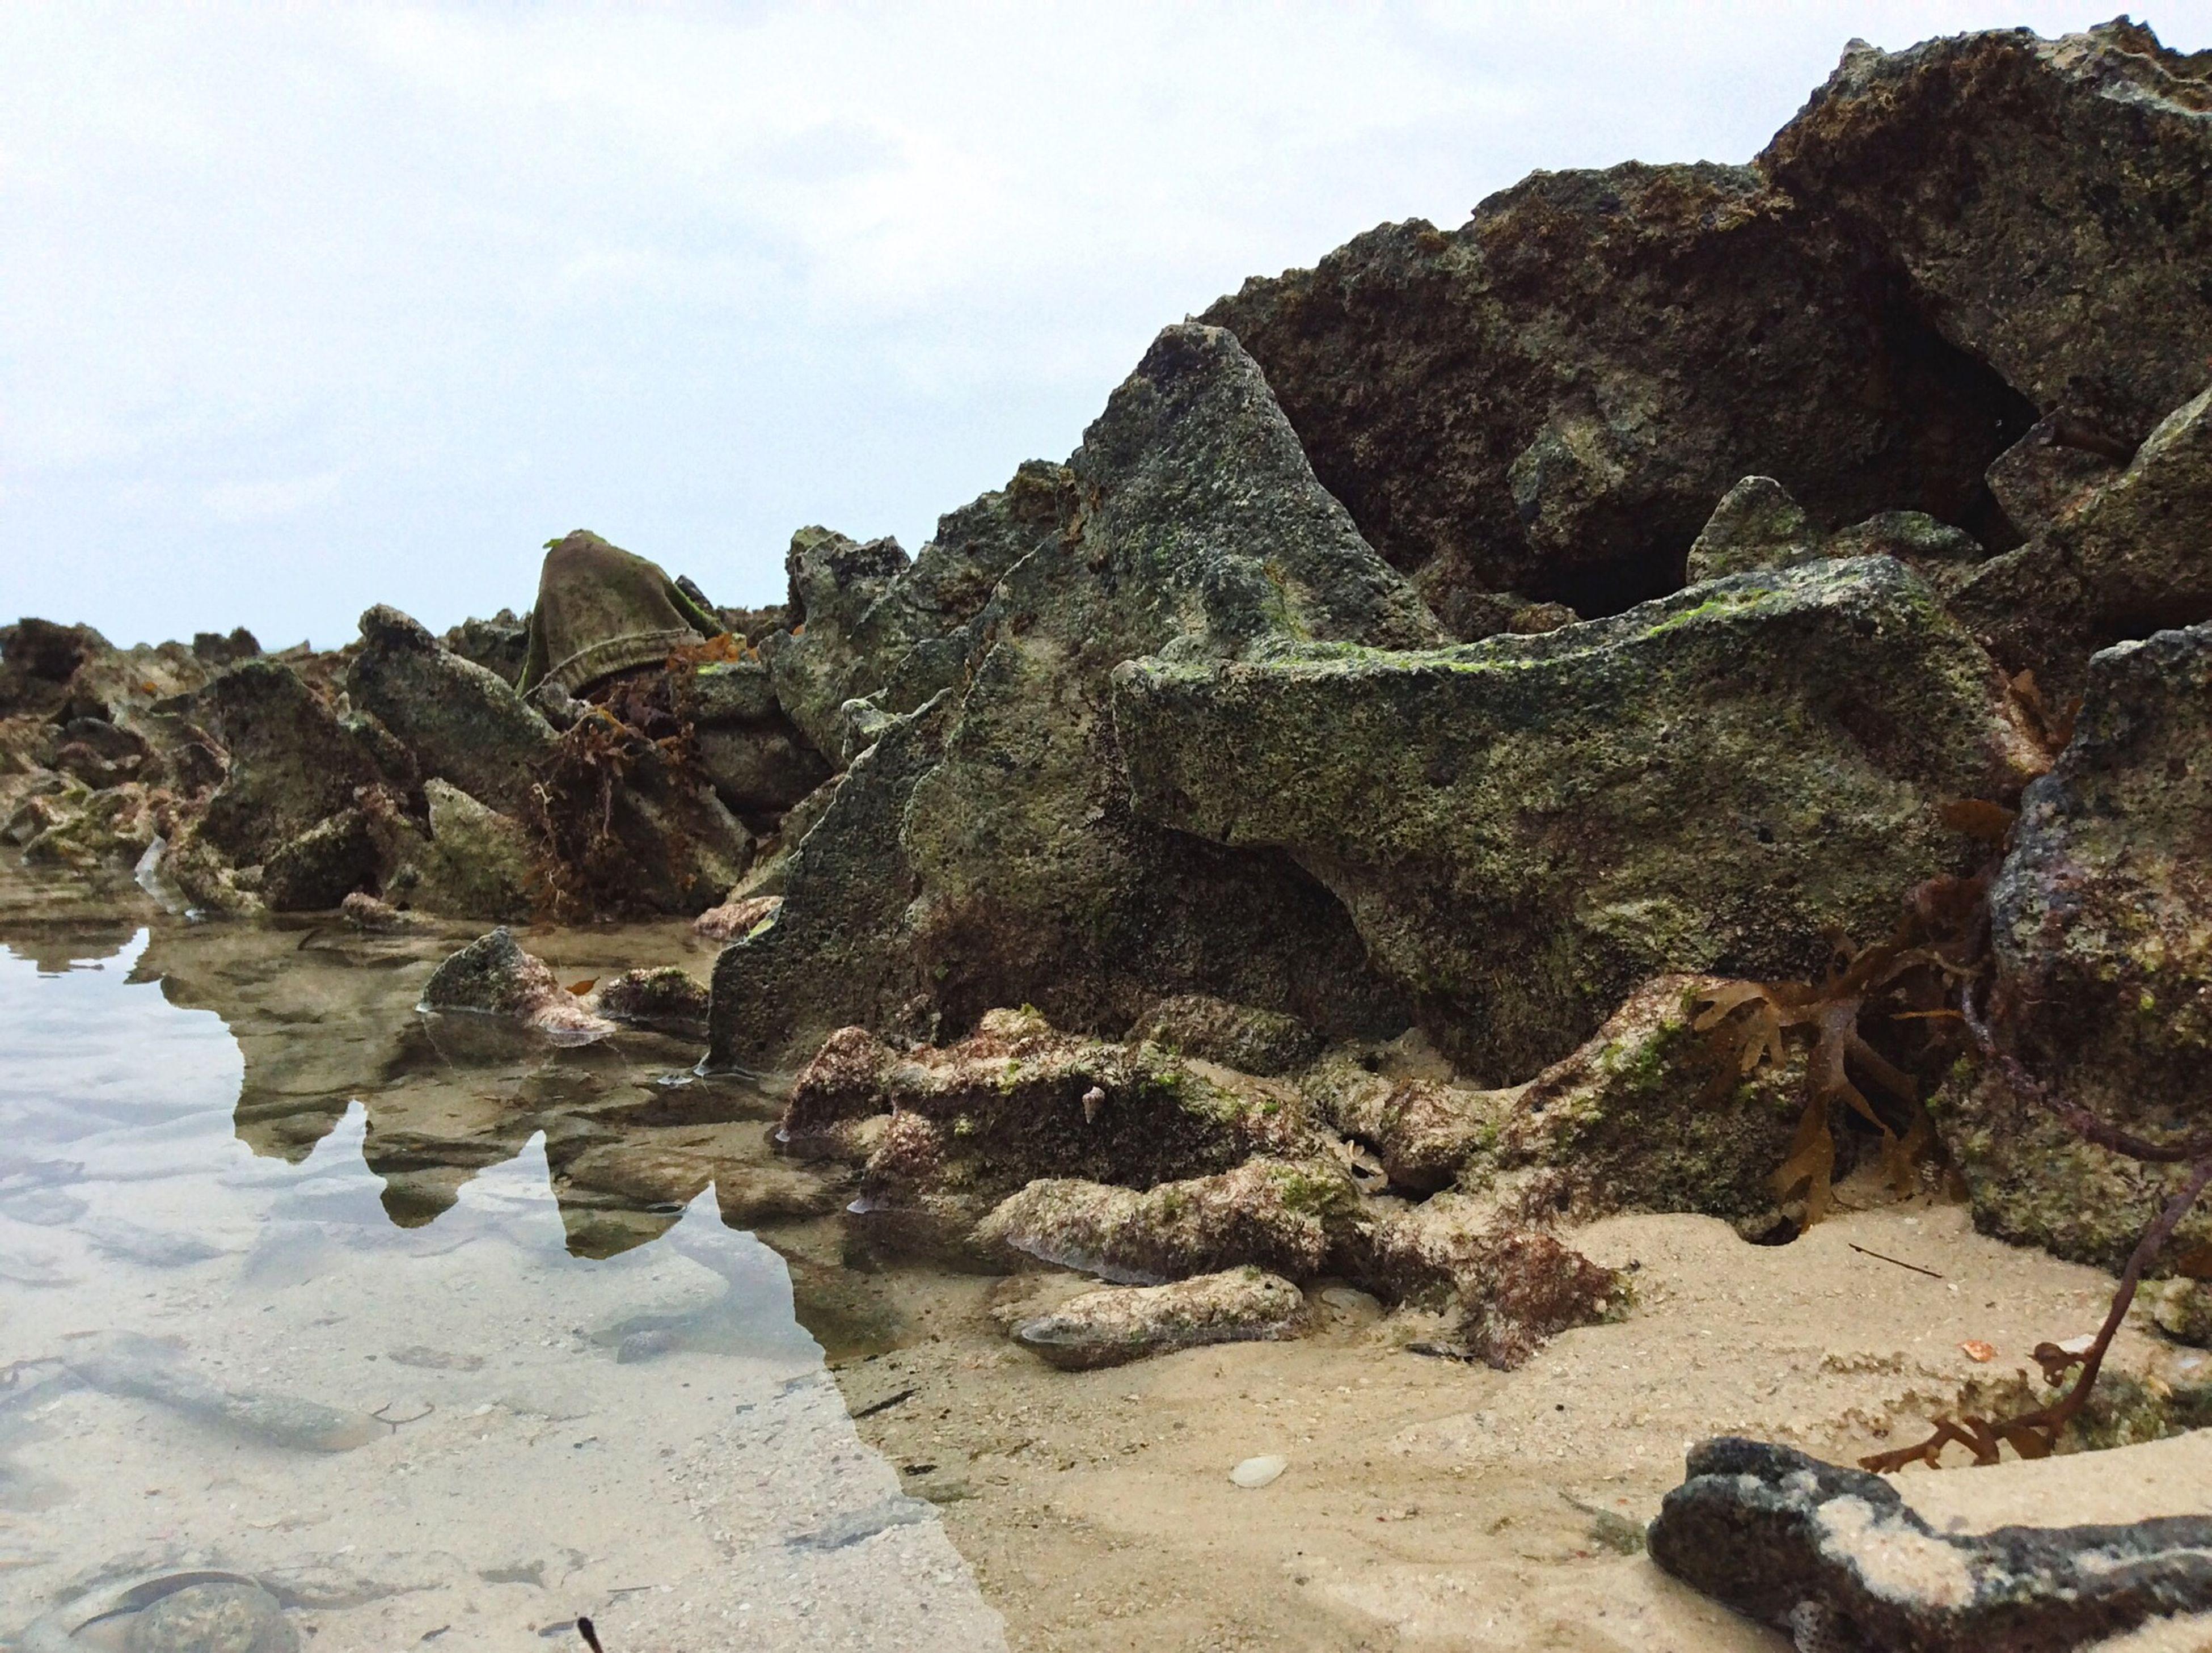 Bite size Krypton. Beach Rocks Water Reflection Traveling First Eyeem Photo